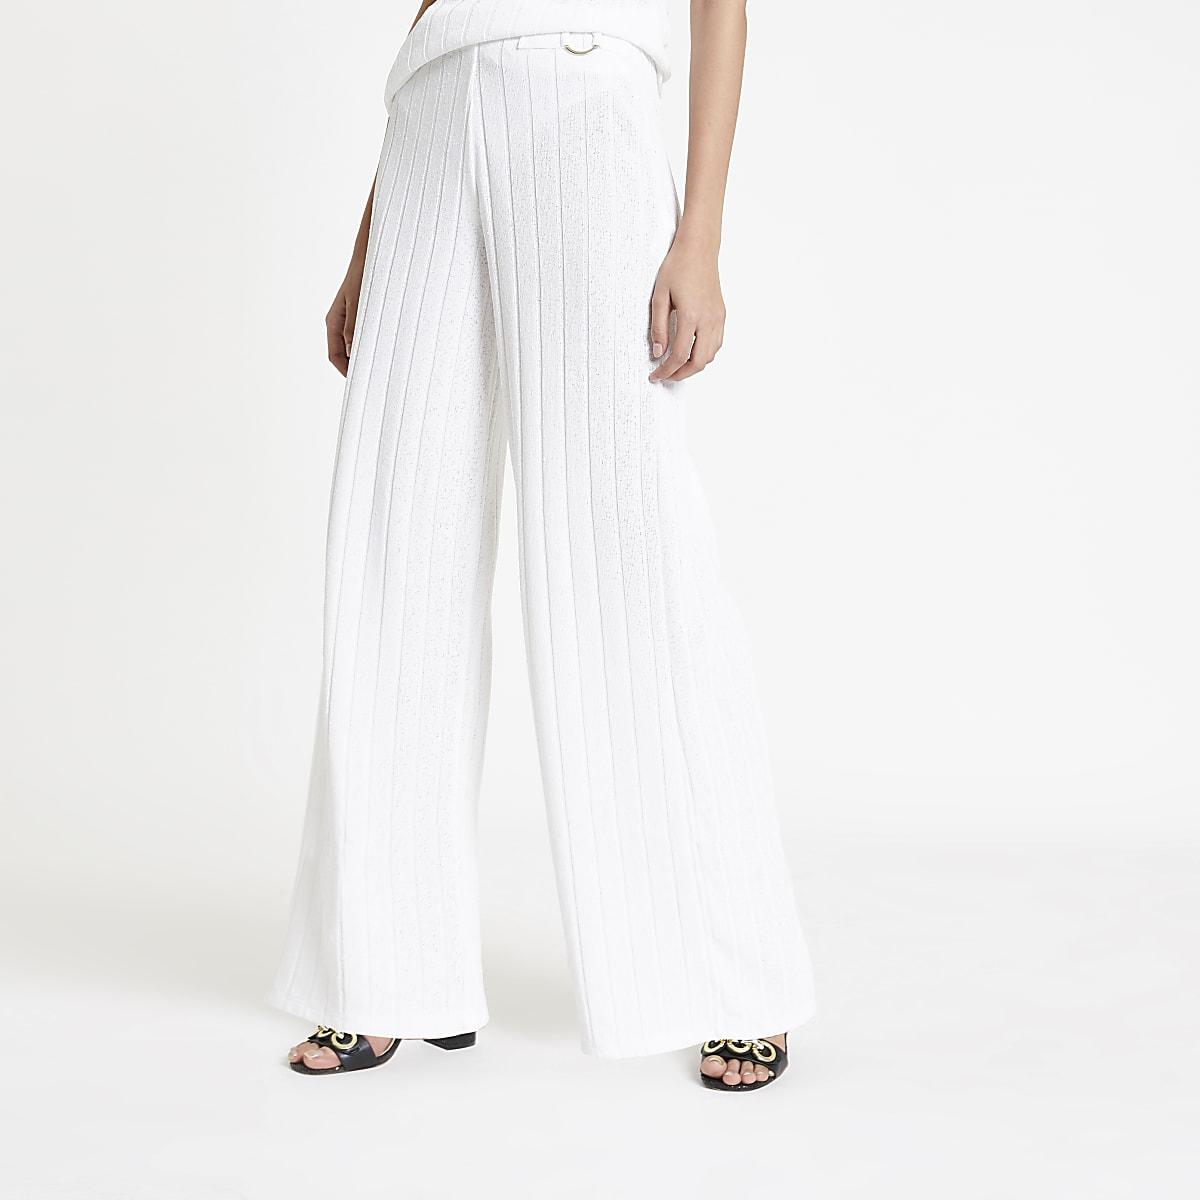 White ribbed wide leg pants